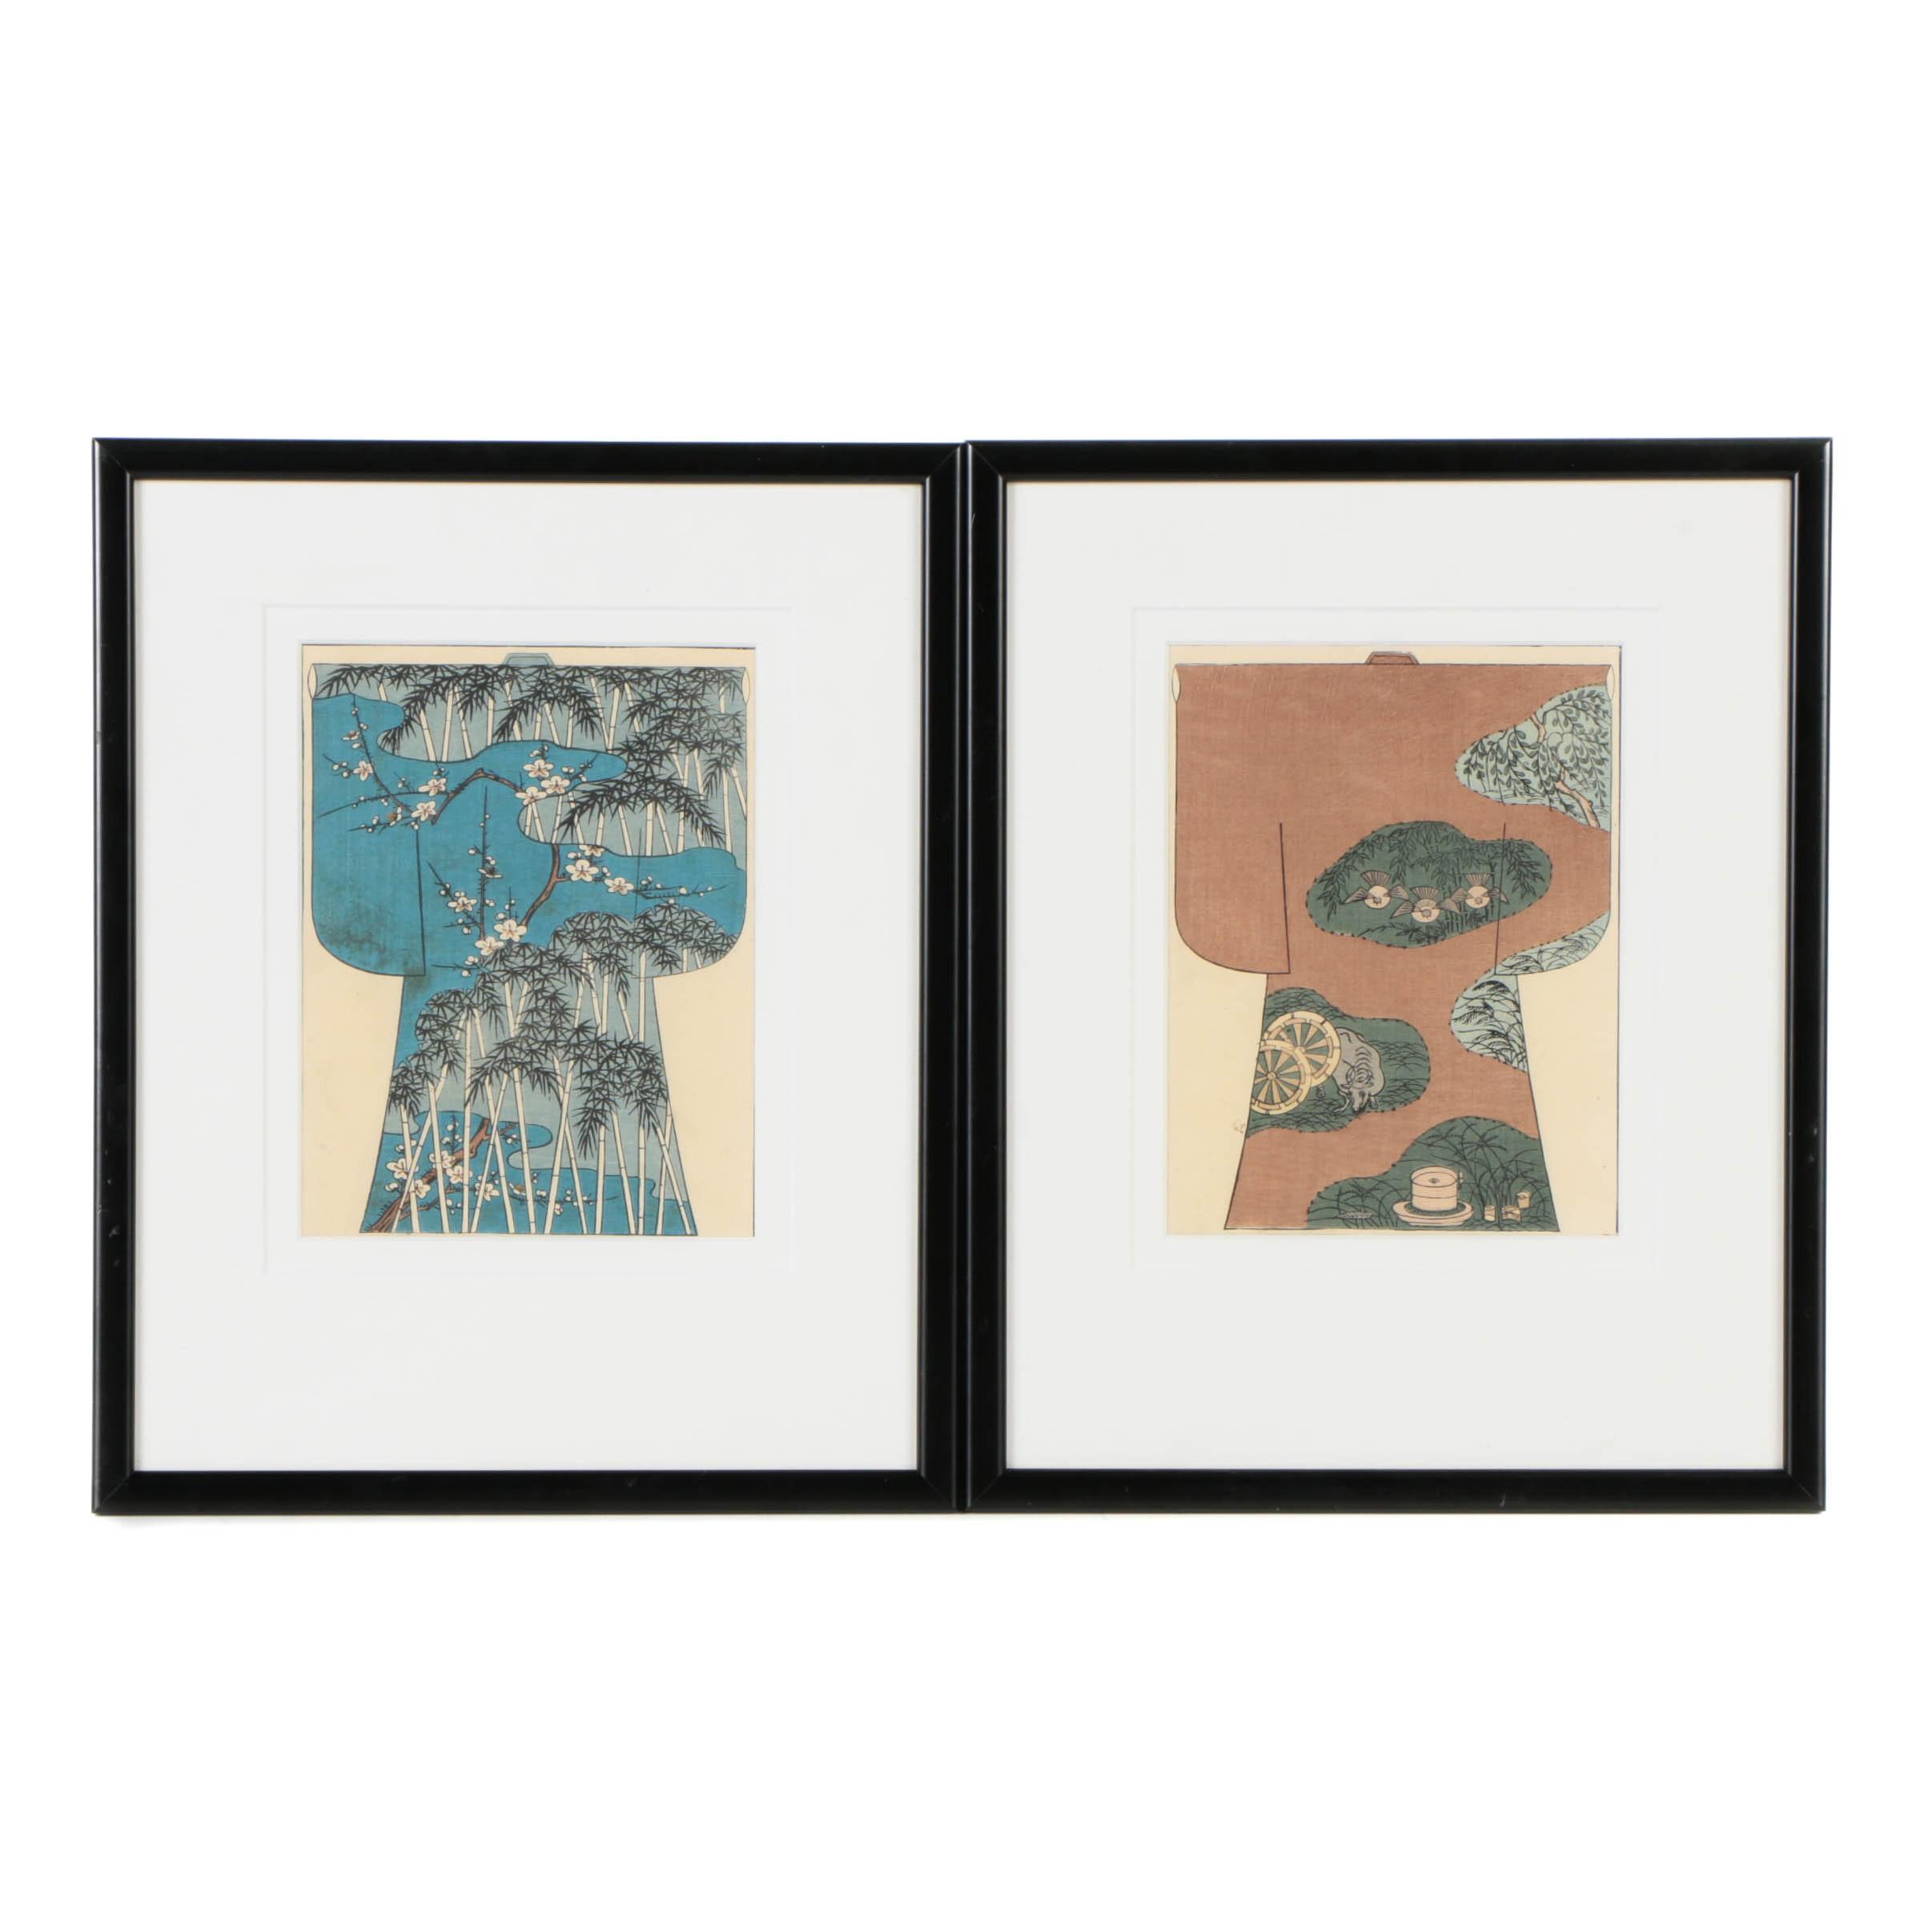 Pair of Japanese Woodblock Prints of Robes